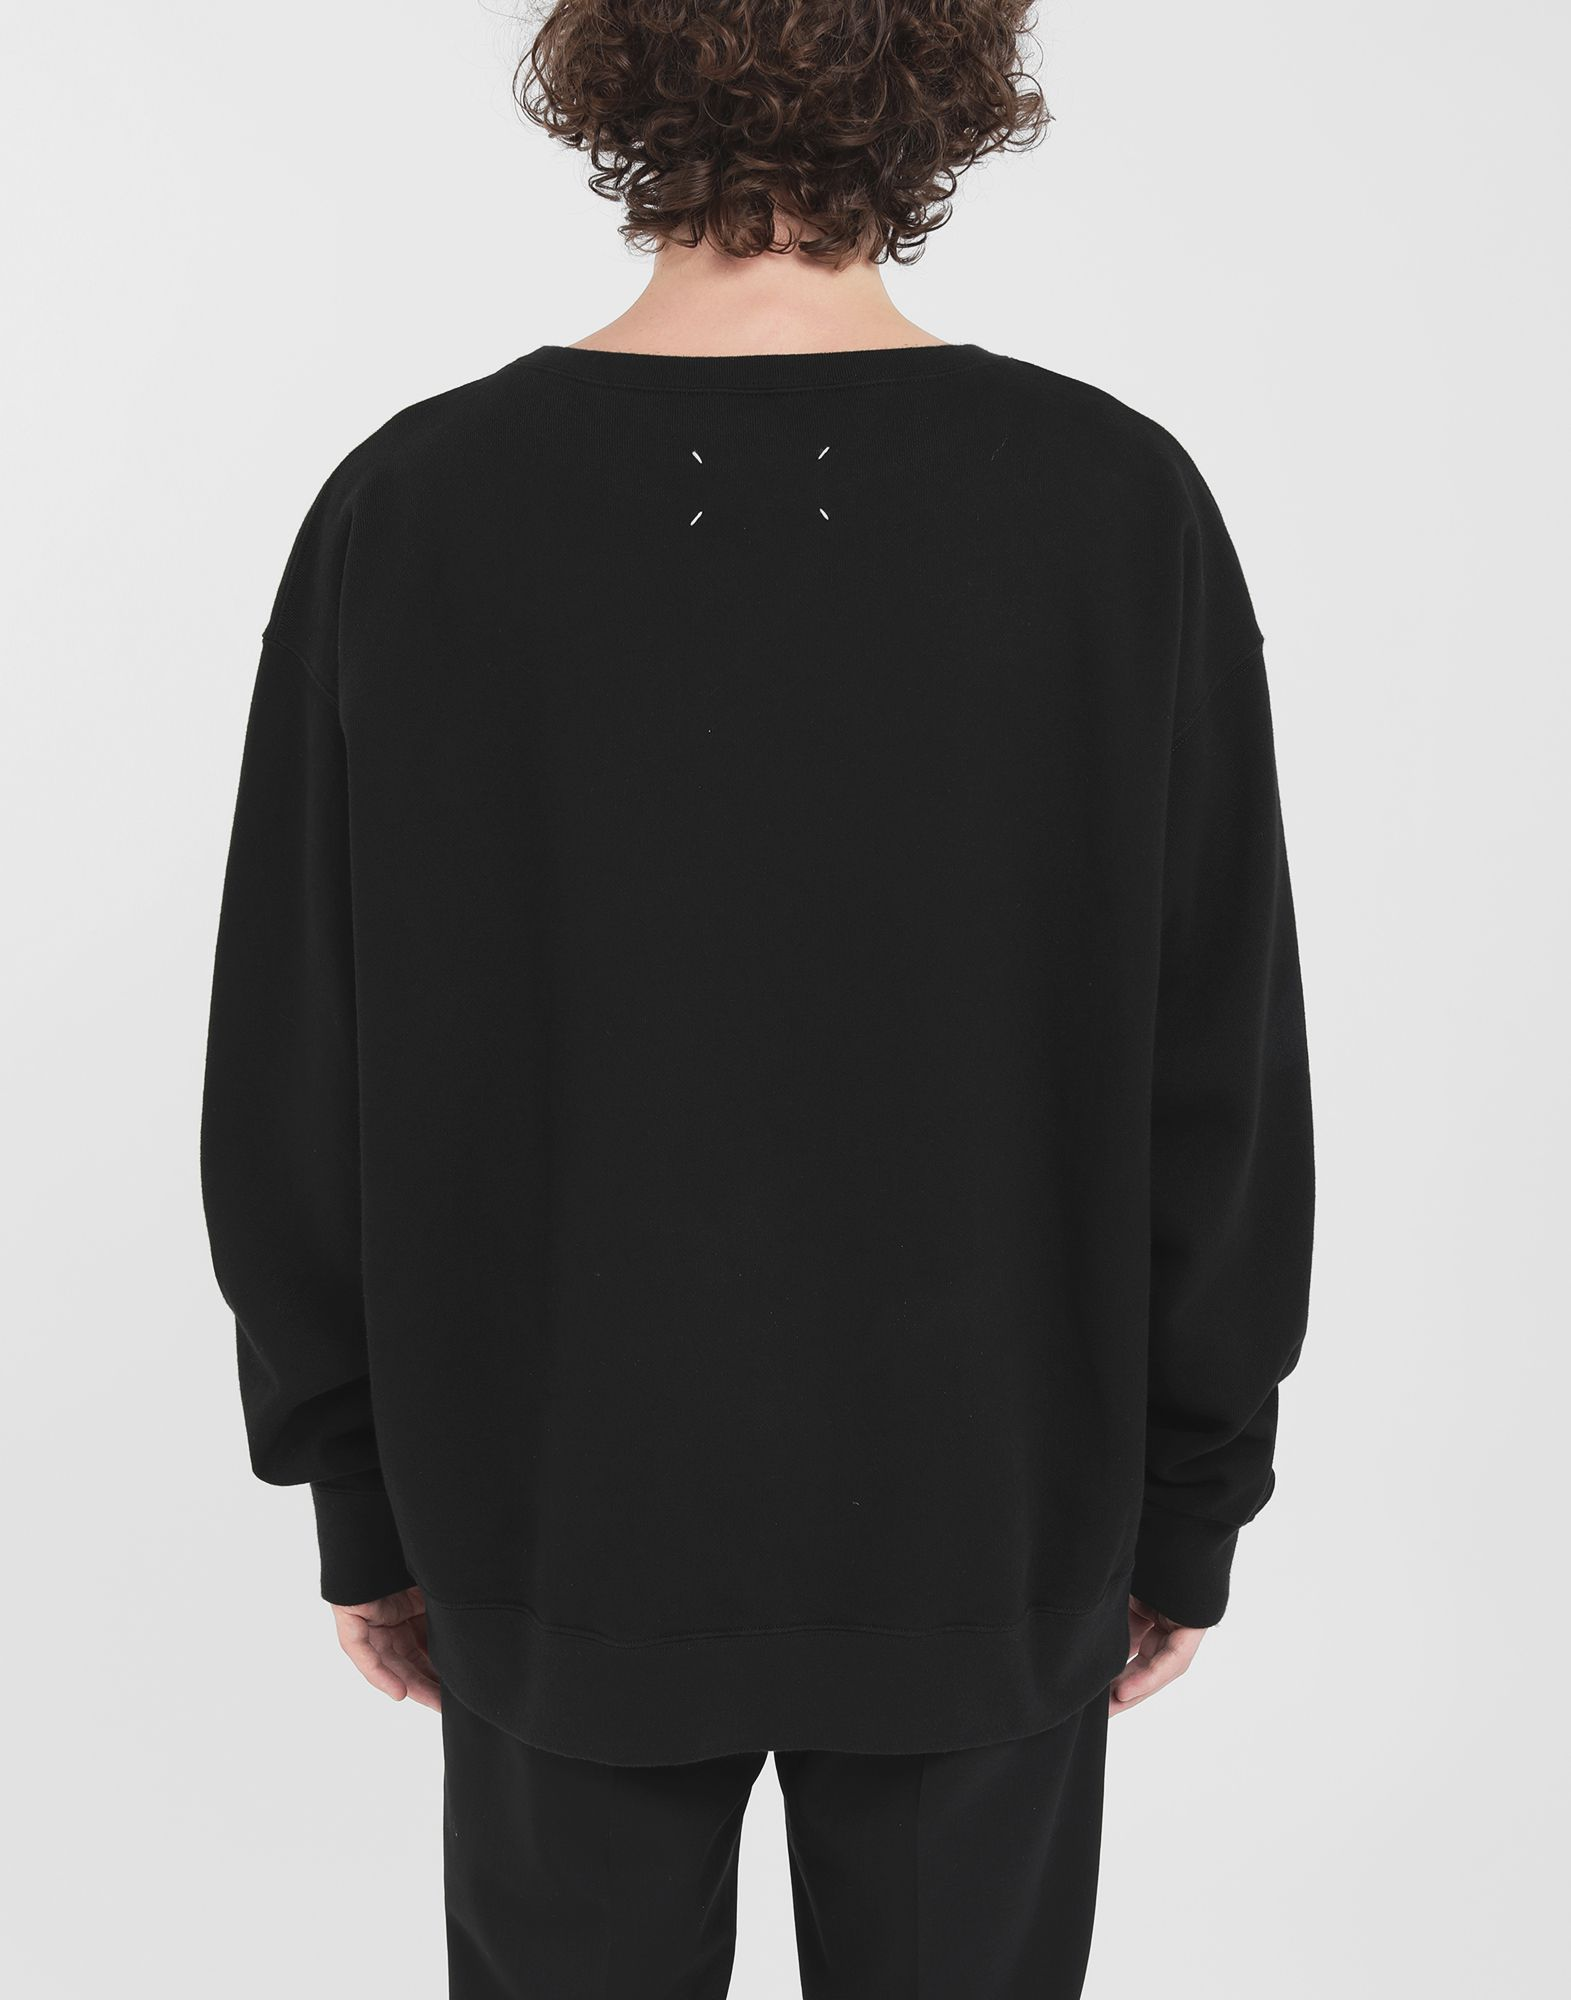 MAISON MARGIELA Flower sweatshirt Sweatshirt Man e